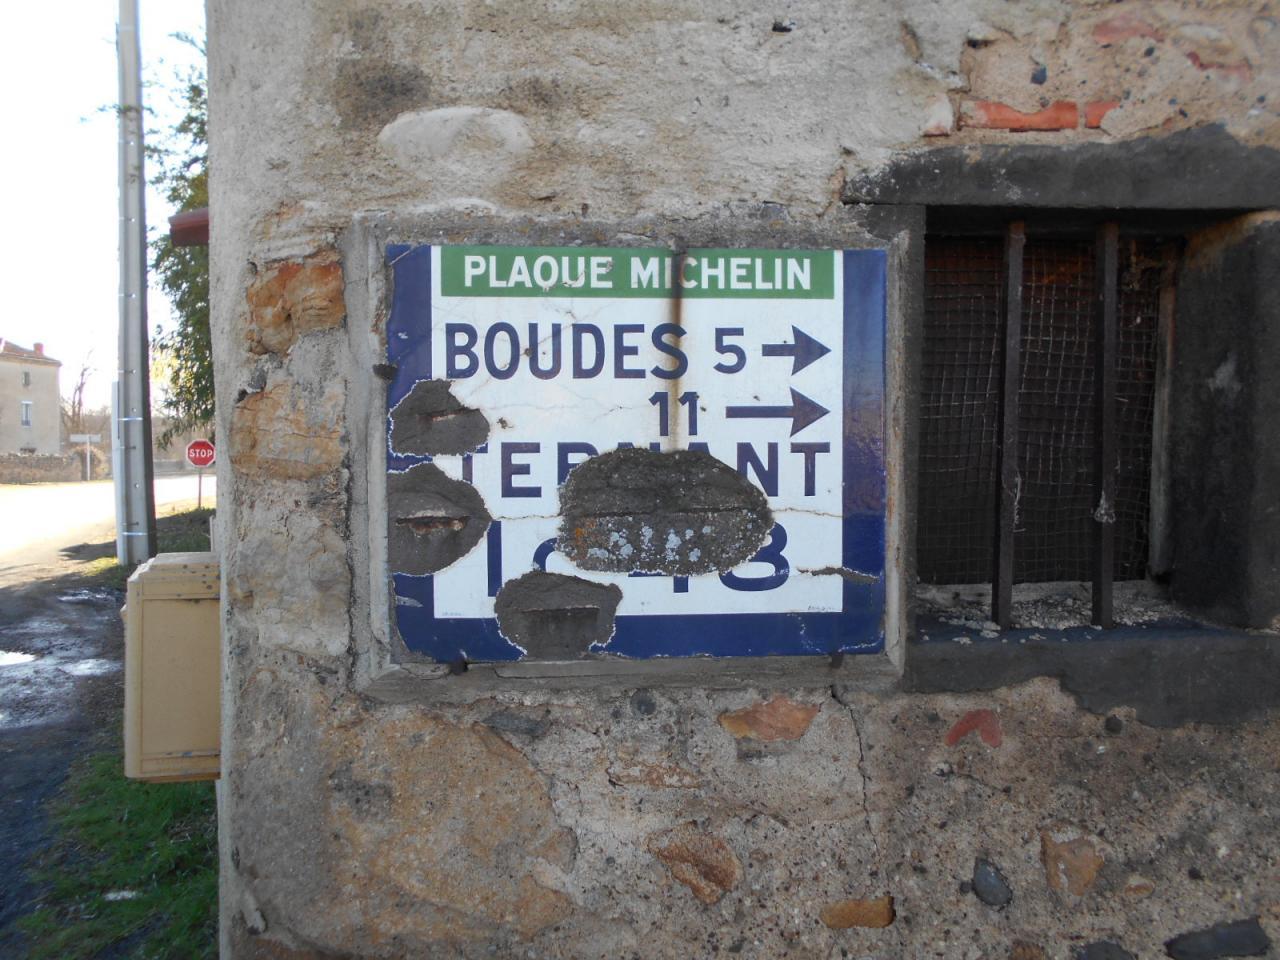 63430 Saint Germain Lembron